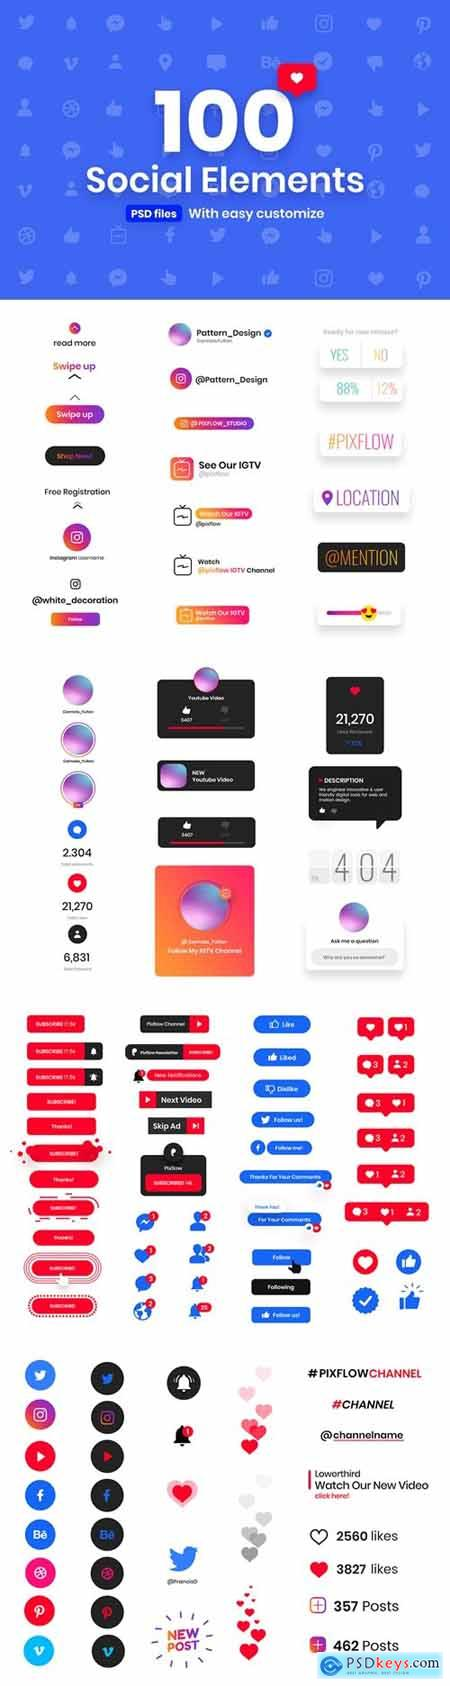 100 Handy Social Elements